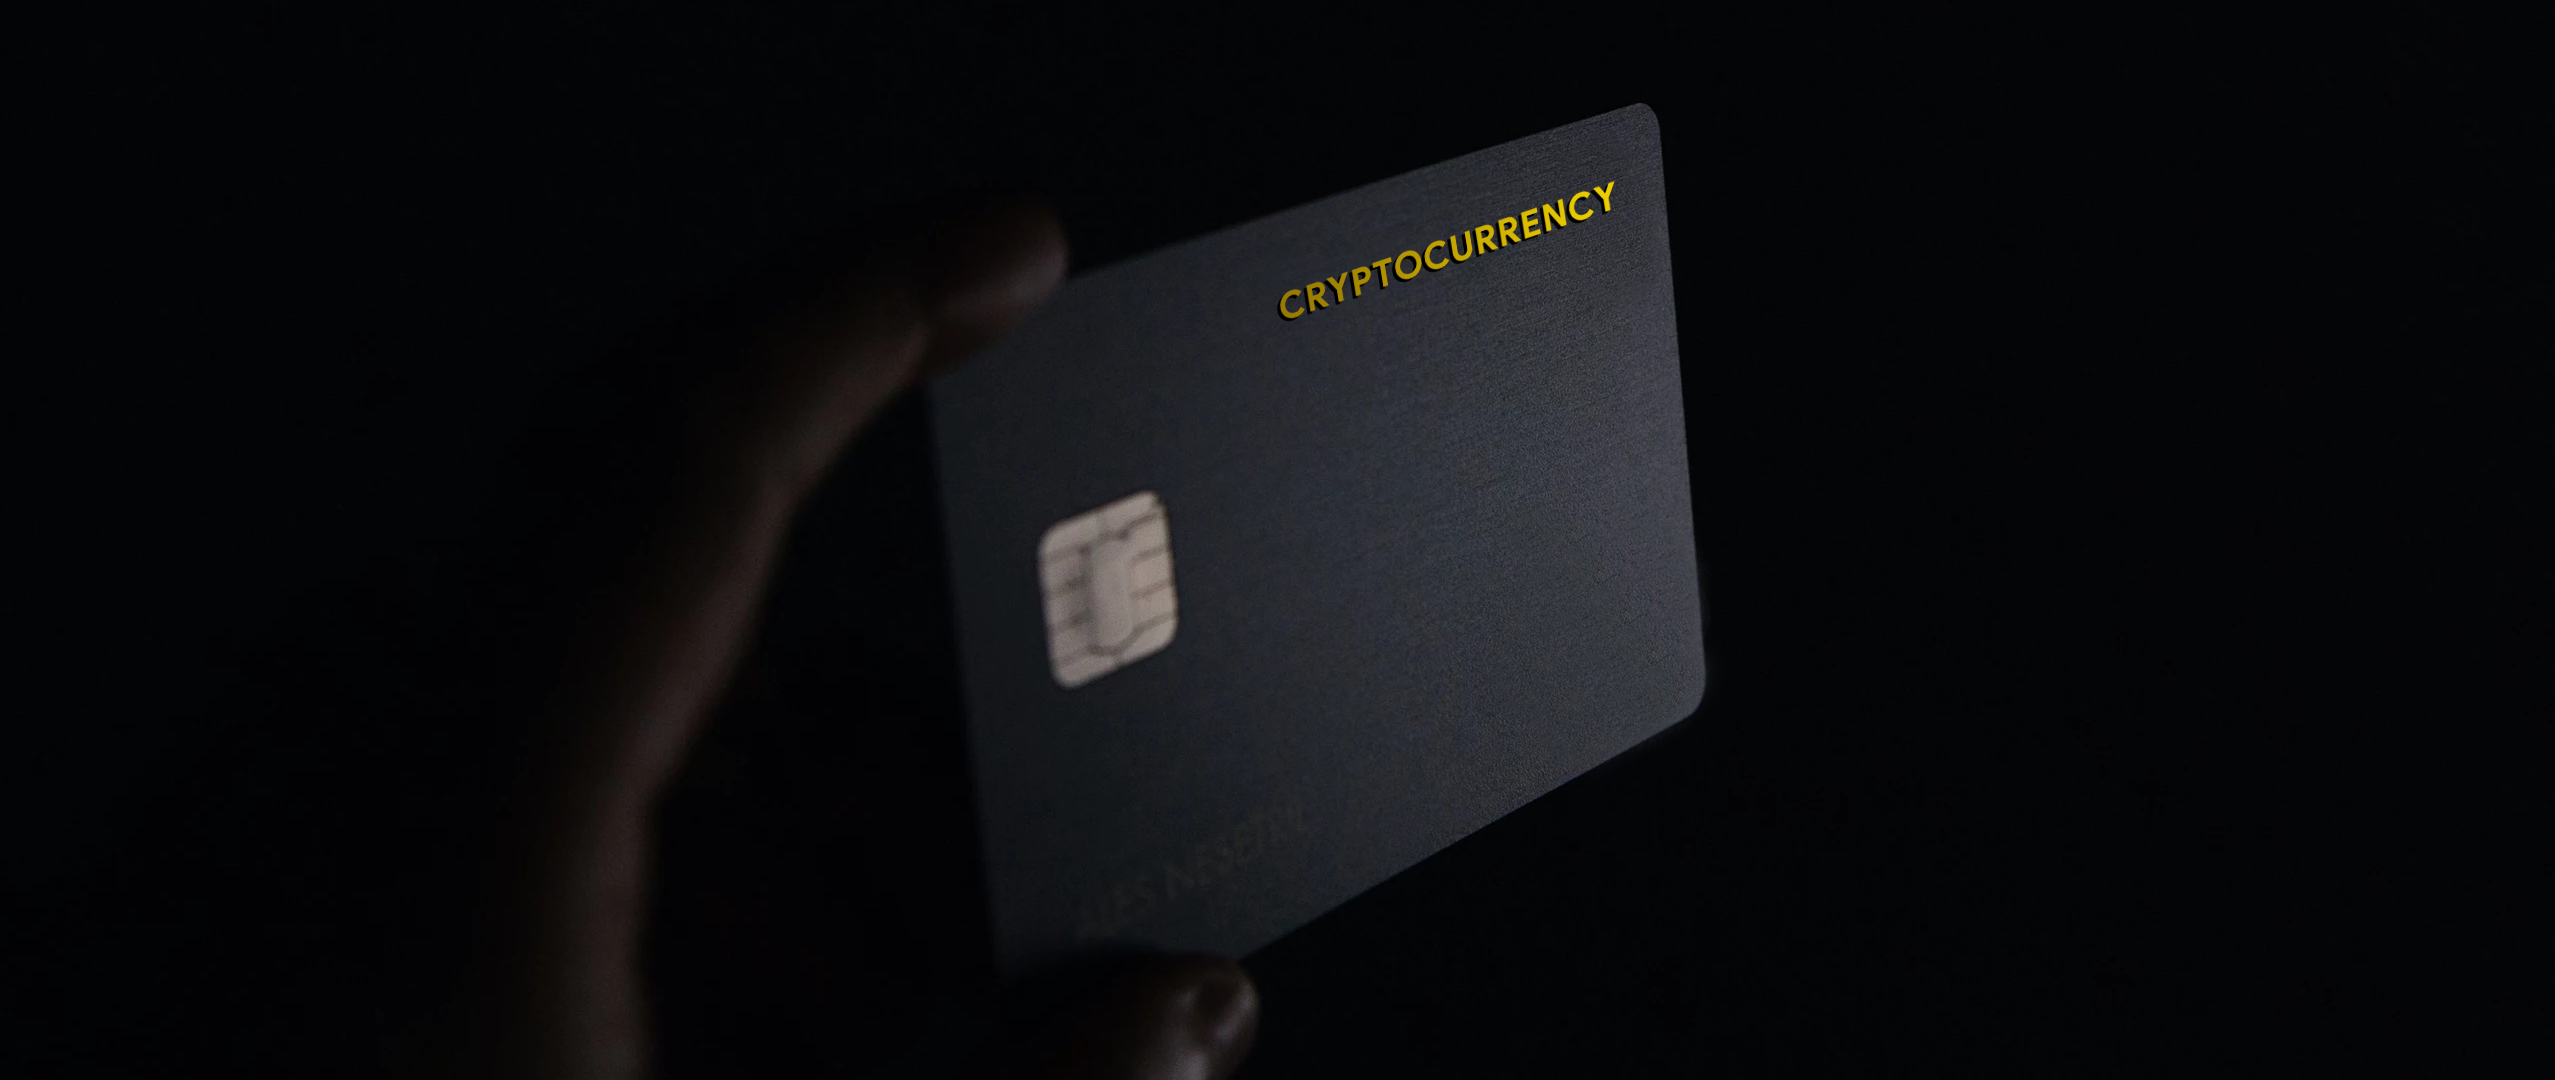 The Blockchain Scalability Problem & the Race for Visa-Like